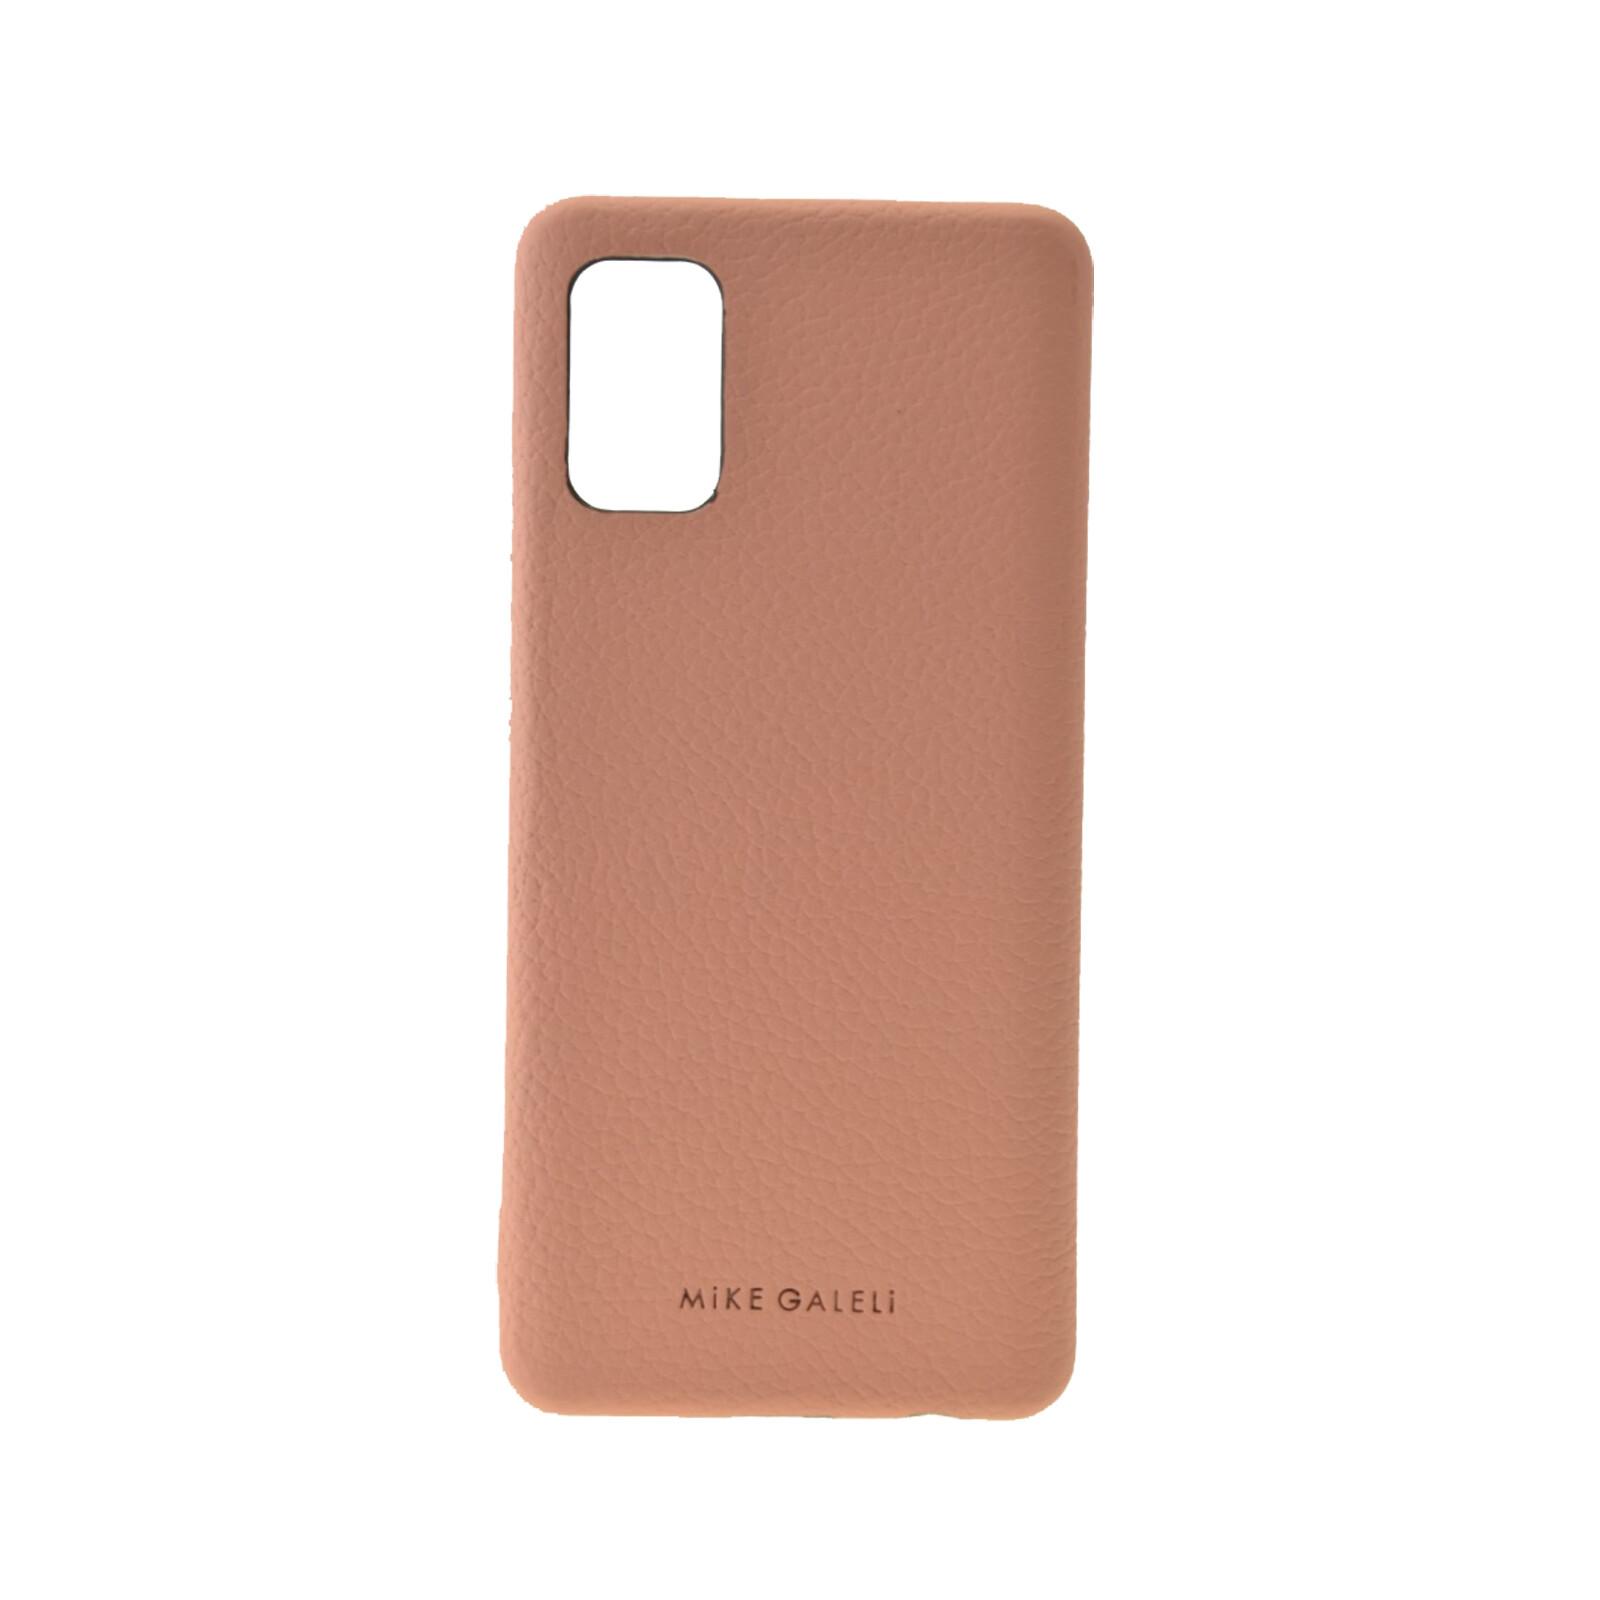 Galeli Backcover FINN Samsung Galaxy A41 blossom